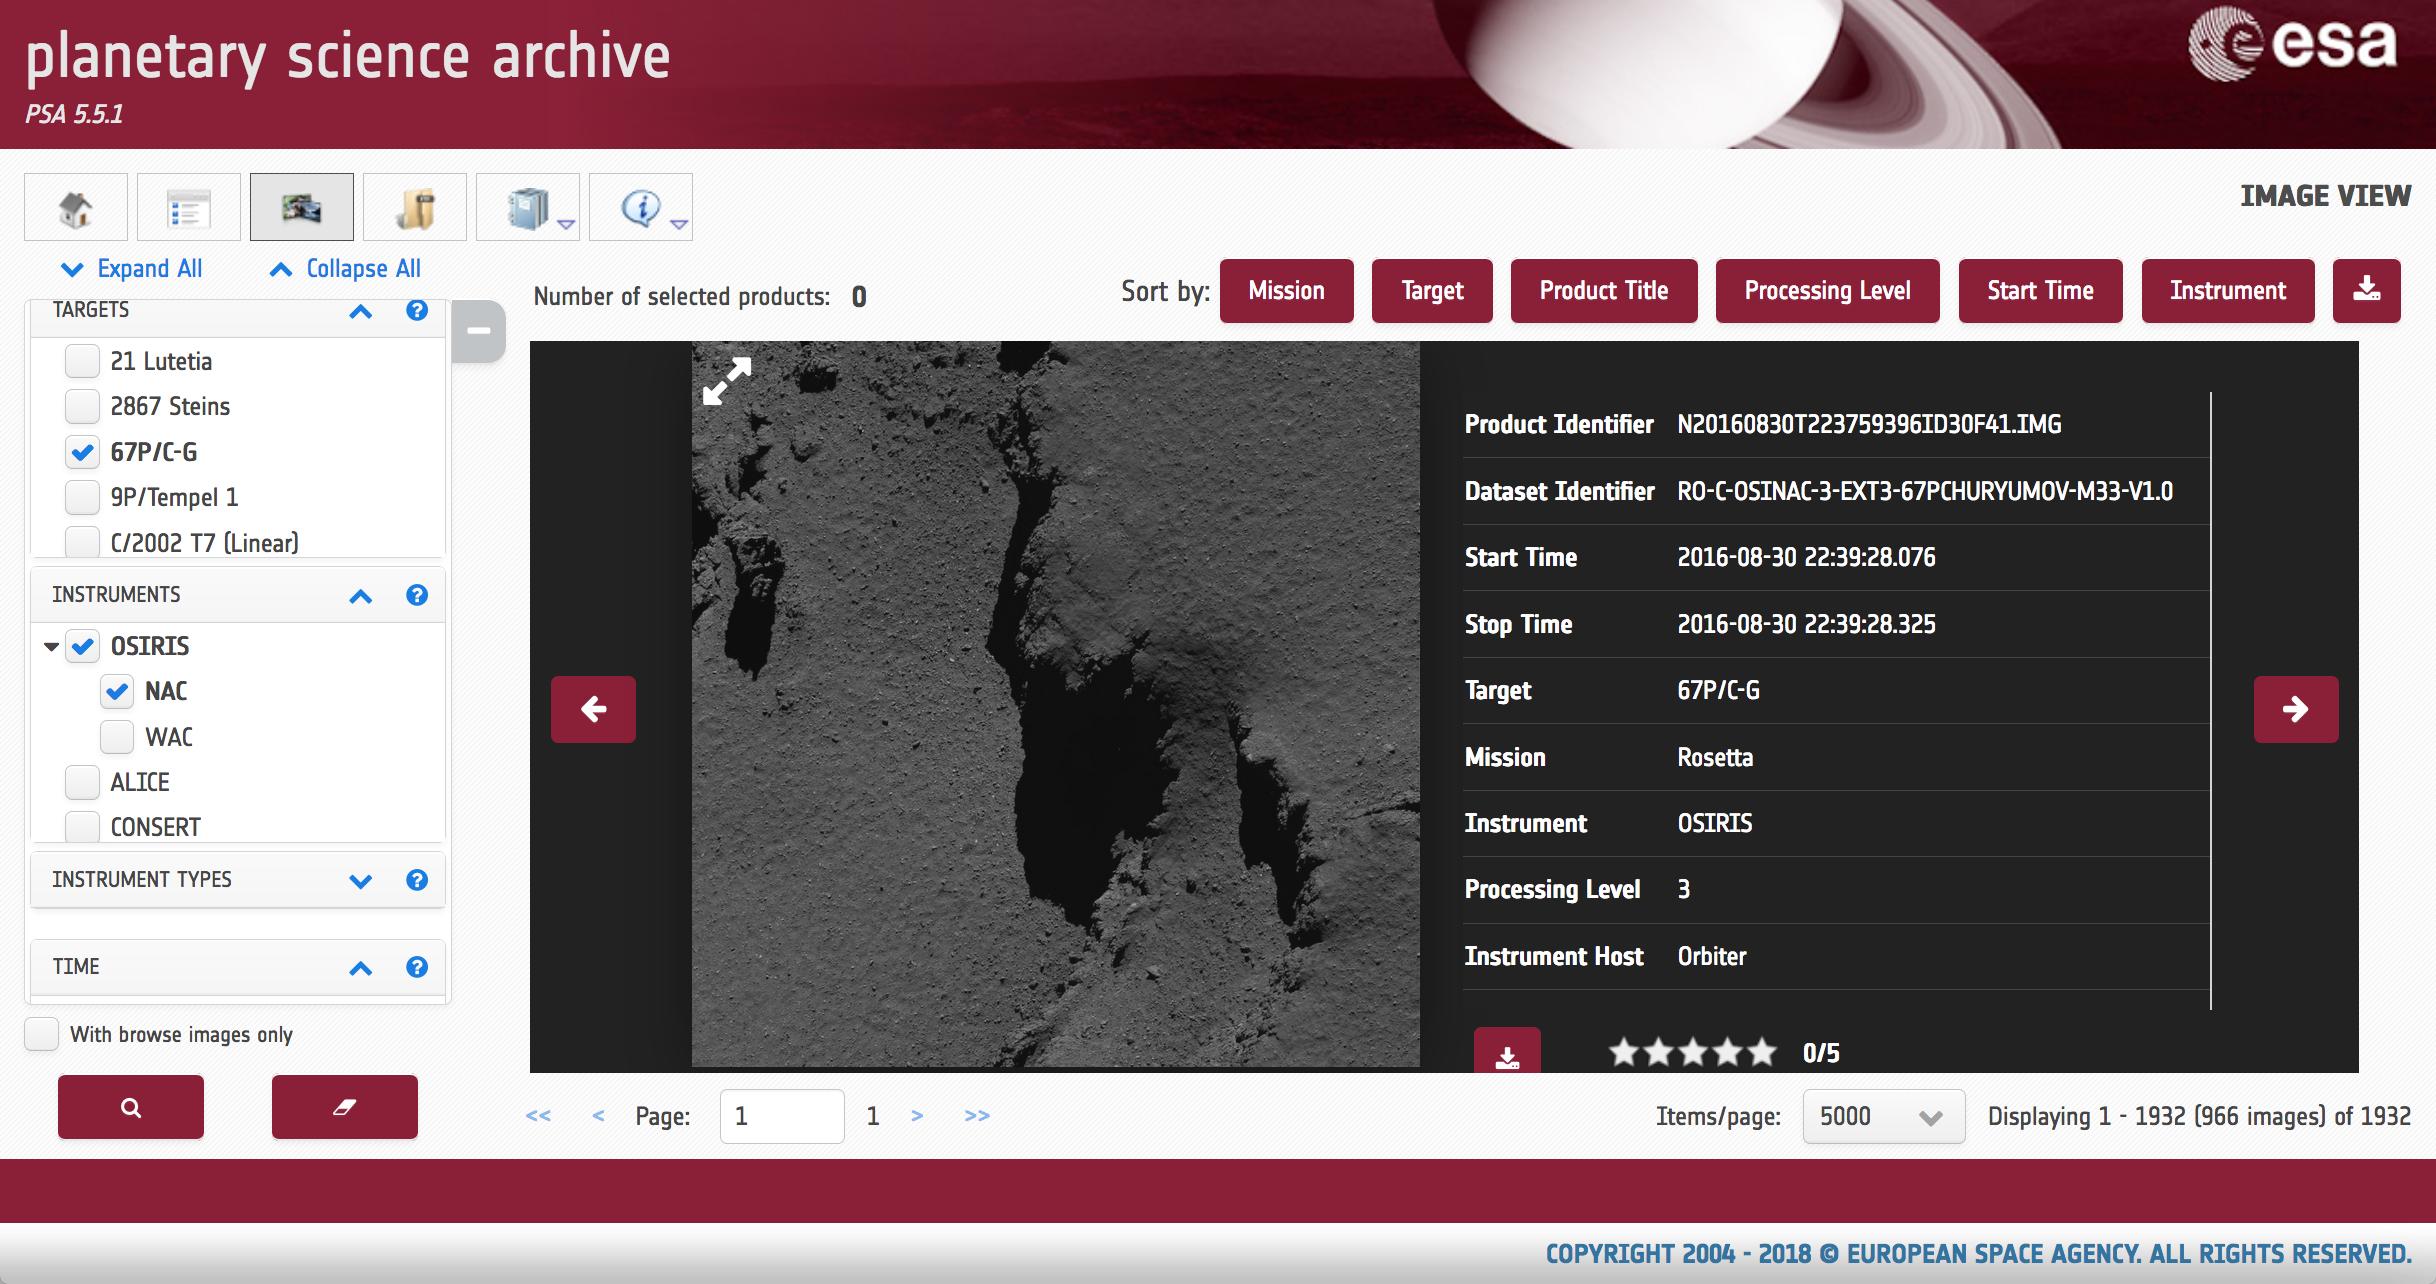 1567213992011-ESA_PSA_Image_Gallery_Rosetta.png